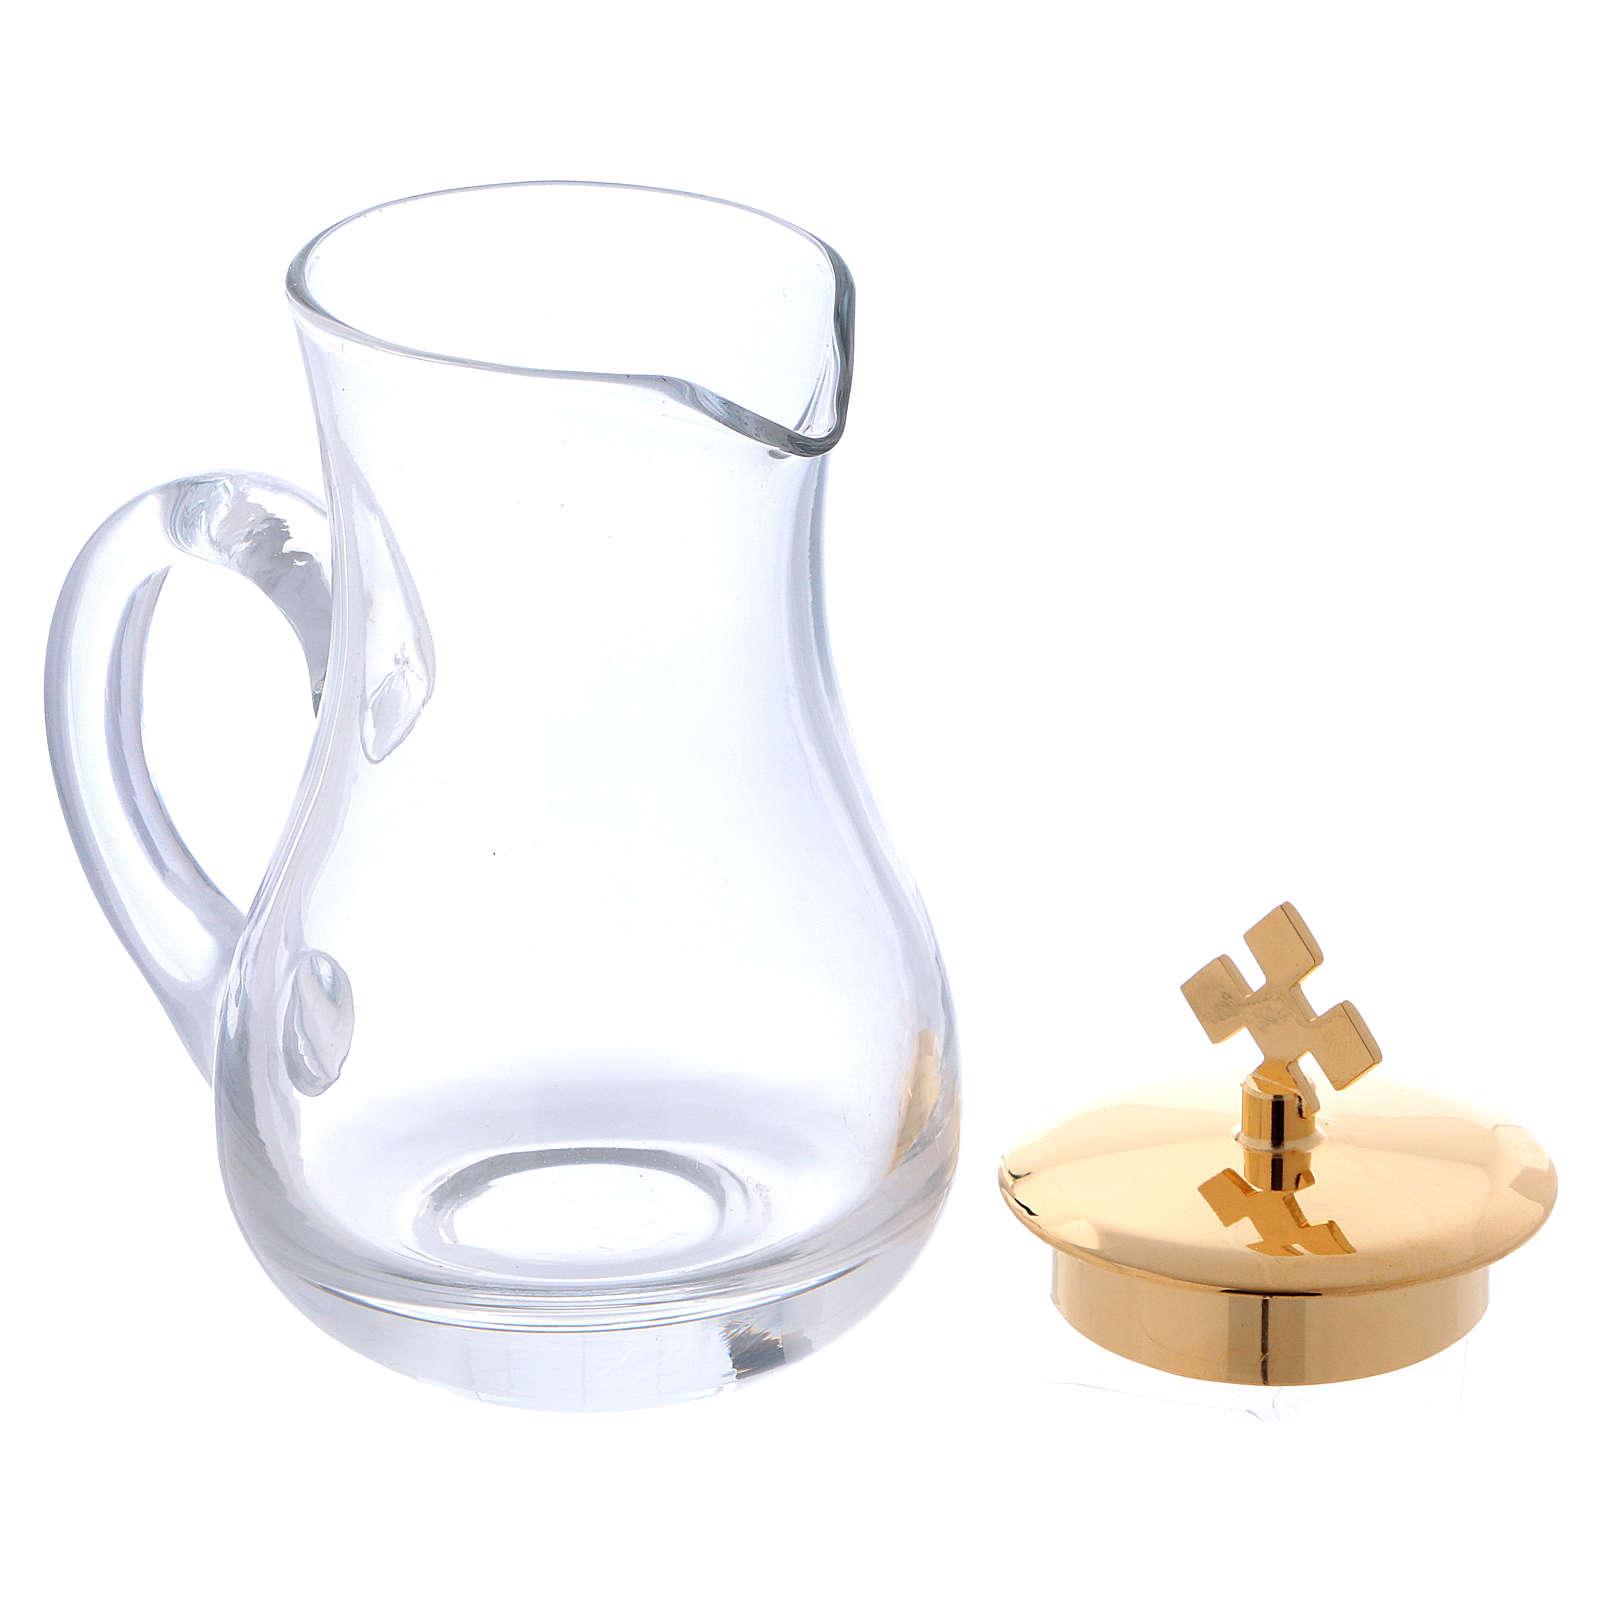 Coppia ampolline su vassoio in vetro 4